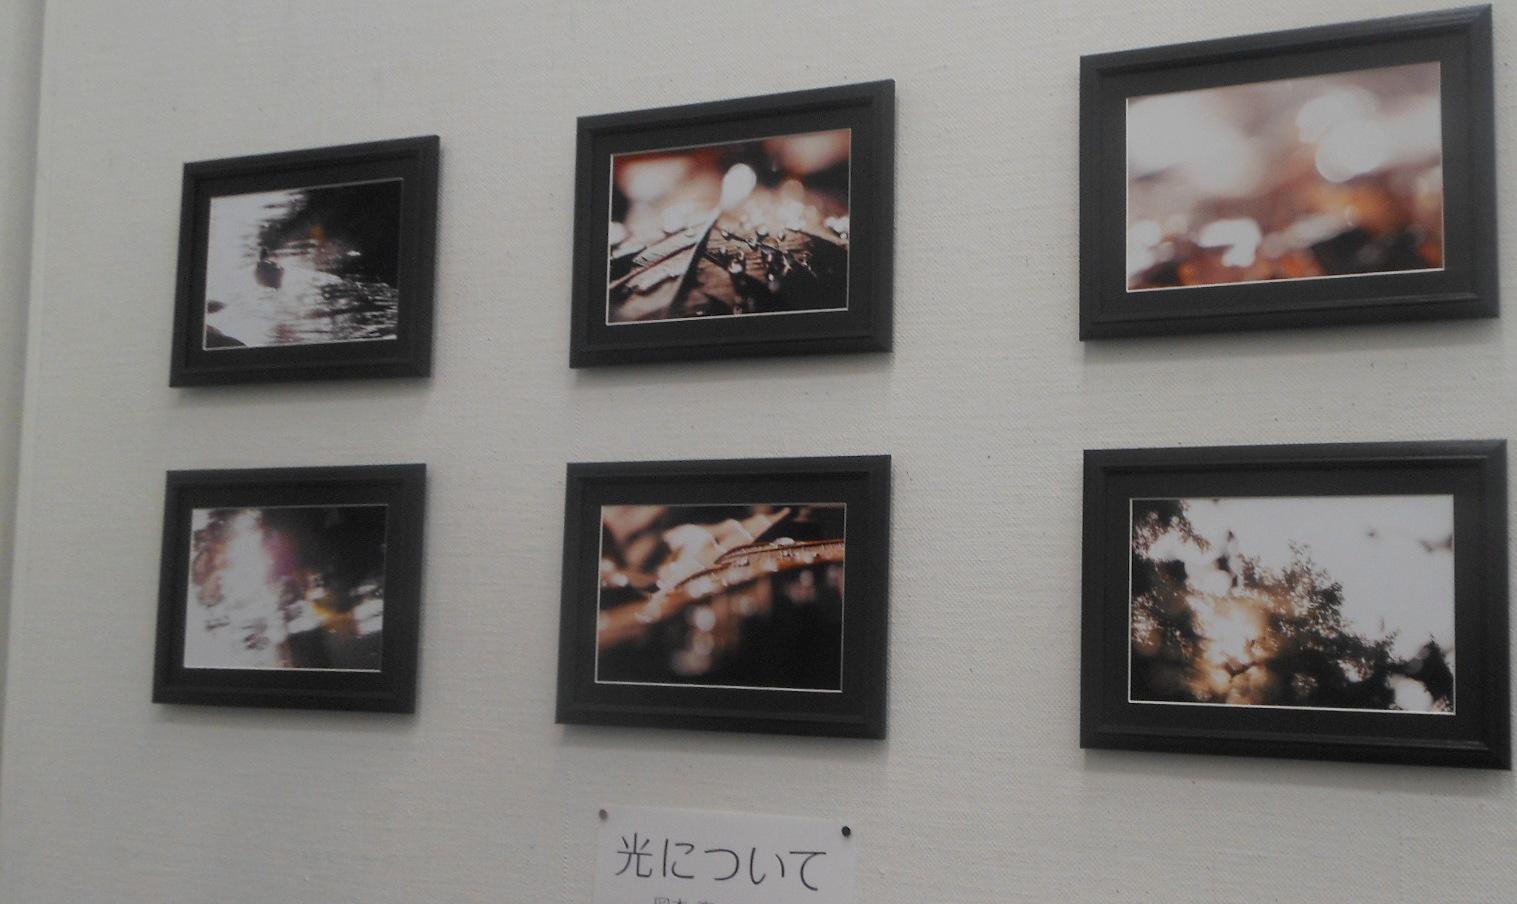 1888)③「写真クラブ「BePHaT!!」 第9回作品展 『夢 Photo 2012』」市民g. 終了11月21日(水)~11月25日(日)_f0126829_101291.jpg